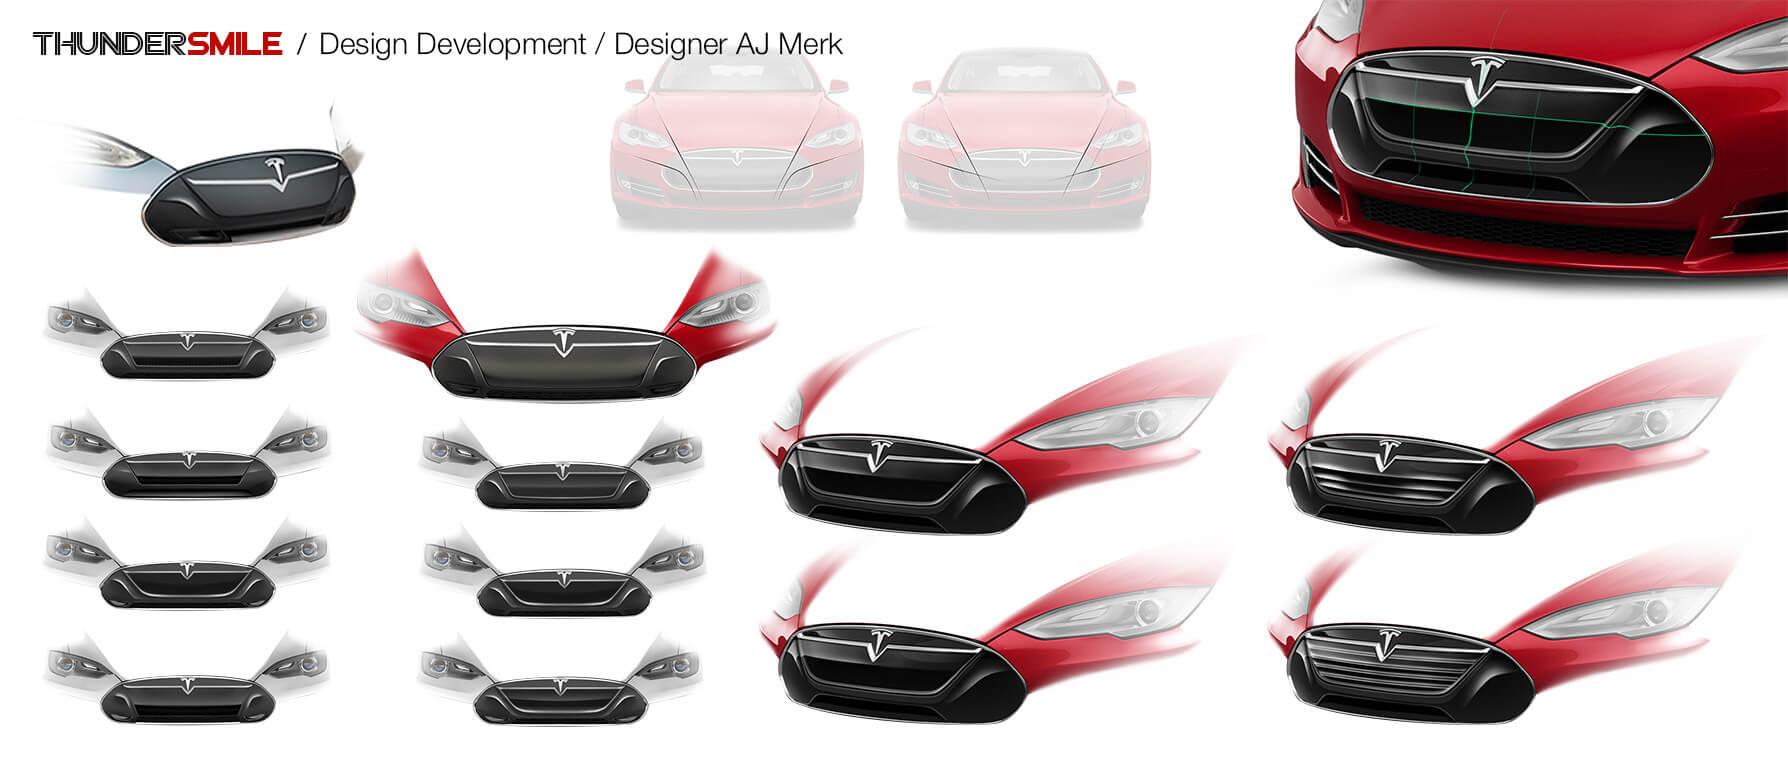 thundersmile-design-development-aj